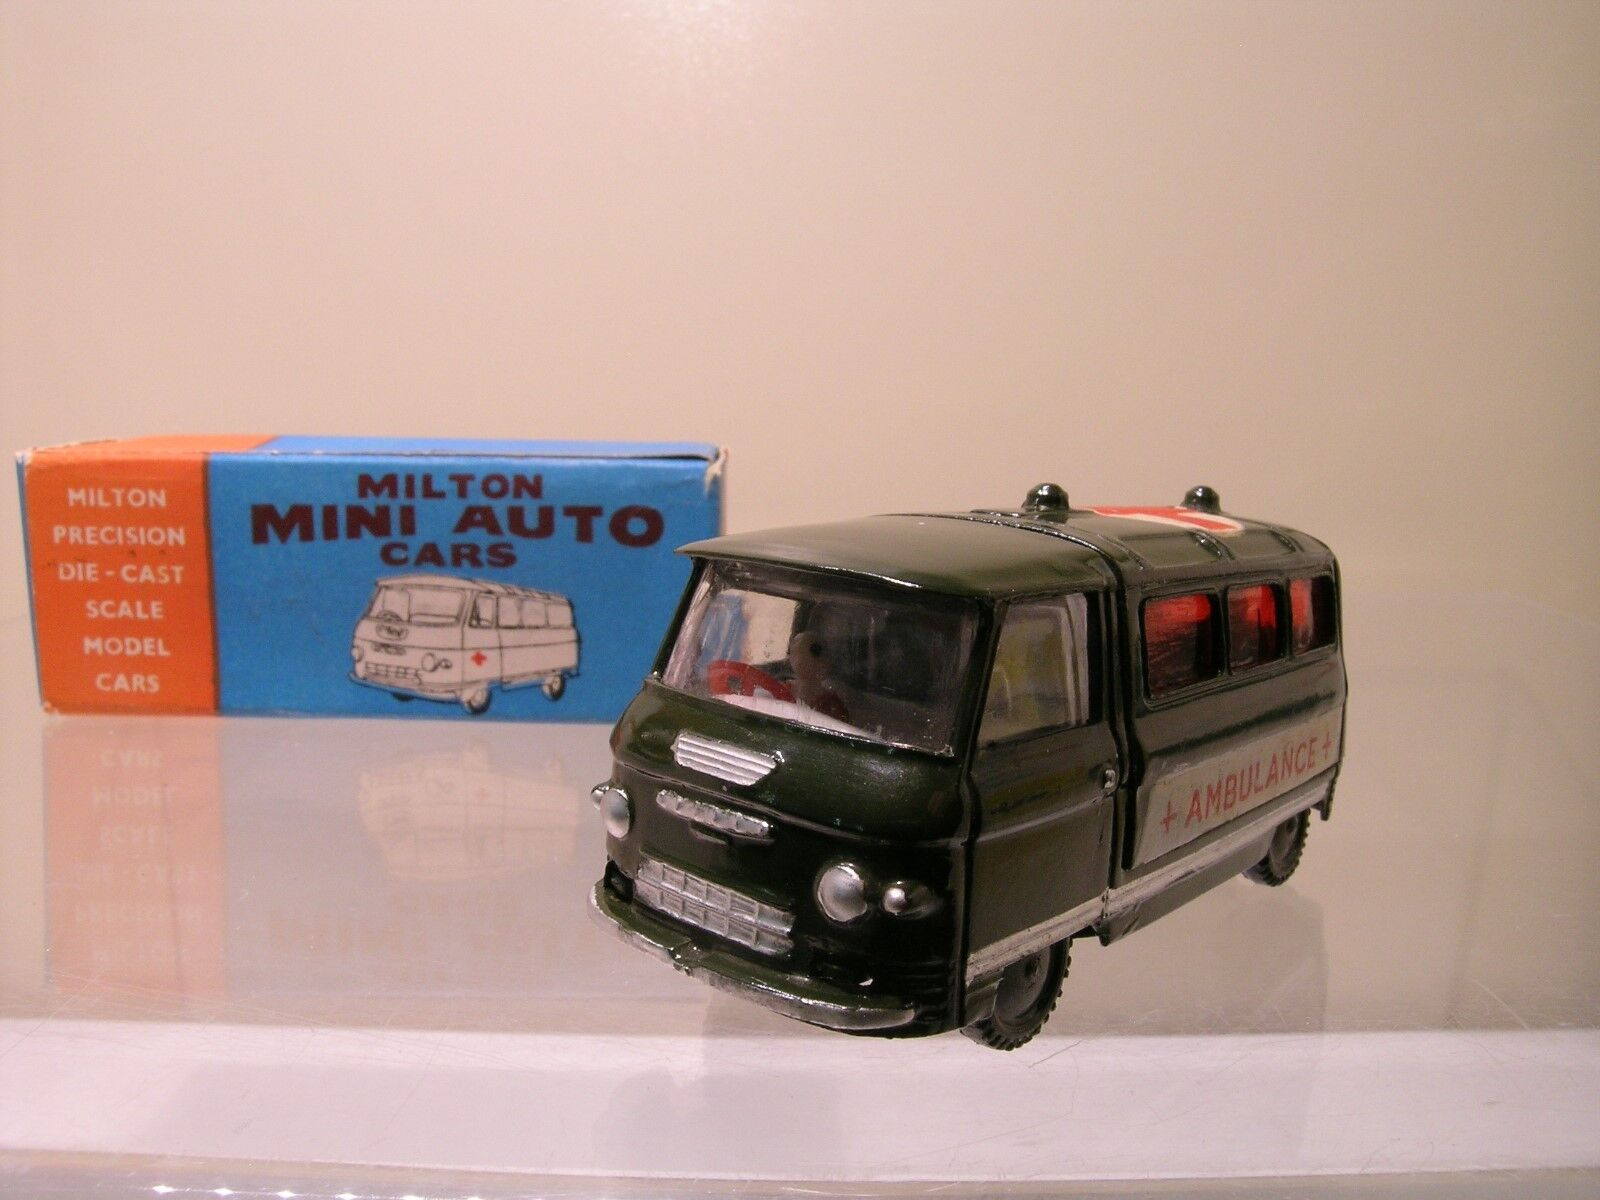 MILTON  MORGAN INDIA No.321 COMMER ARMY AMBULANCE vert NEAR-MINT + BOX 1 43  prix les plus bas